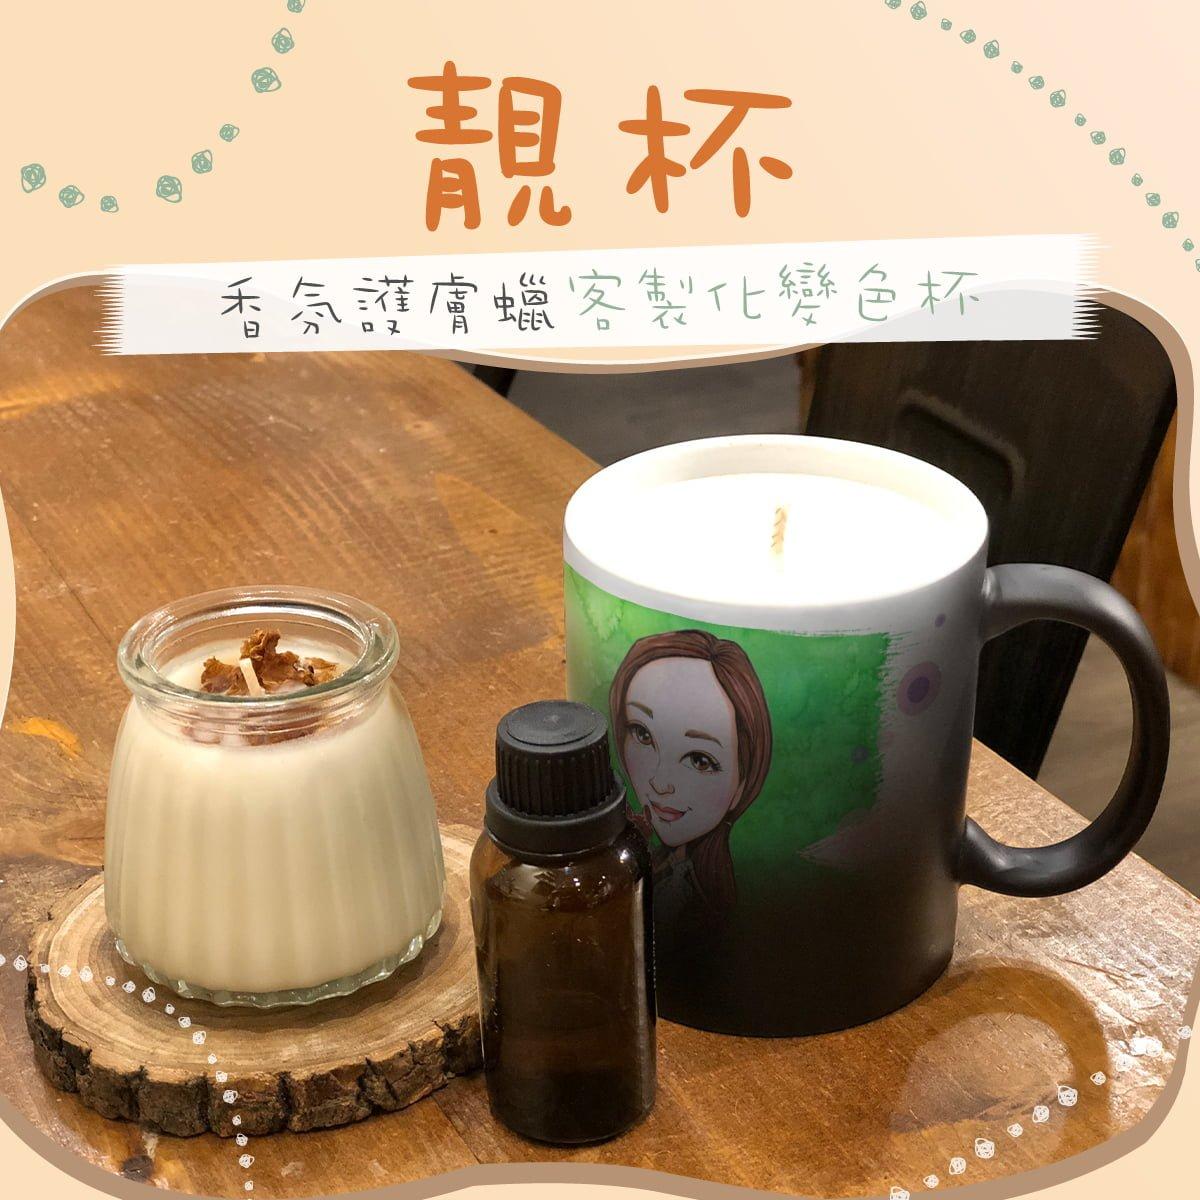 1100107B 靚杯 – 香氛護膚蠟客製化變色杯